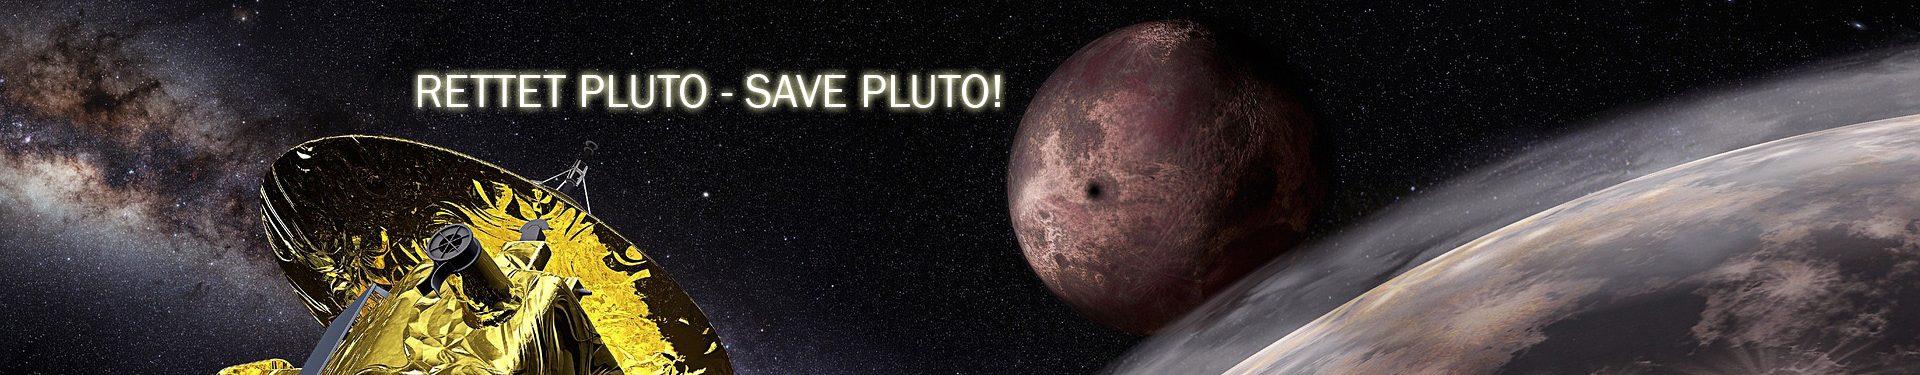 Rettet Pluto